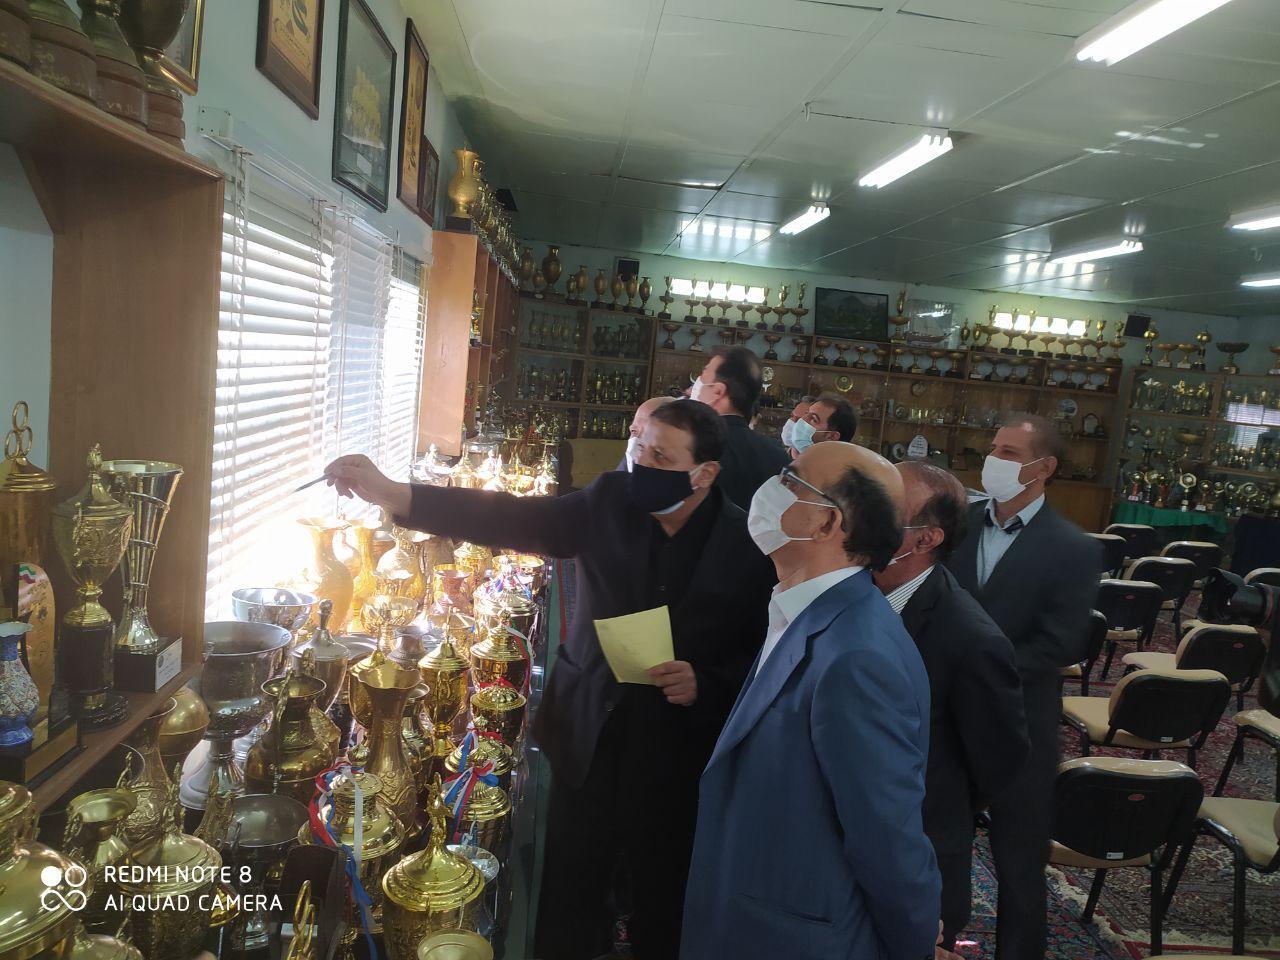 photo ۲۰۲۰ ۱۰ ۱۱ ۰۹ ۴۱ ۲۶3 Copy سپاهان اصفهان, لیگ برتر فوتبال